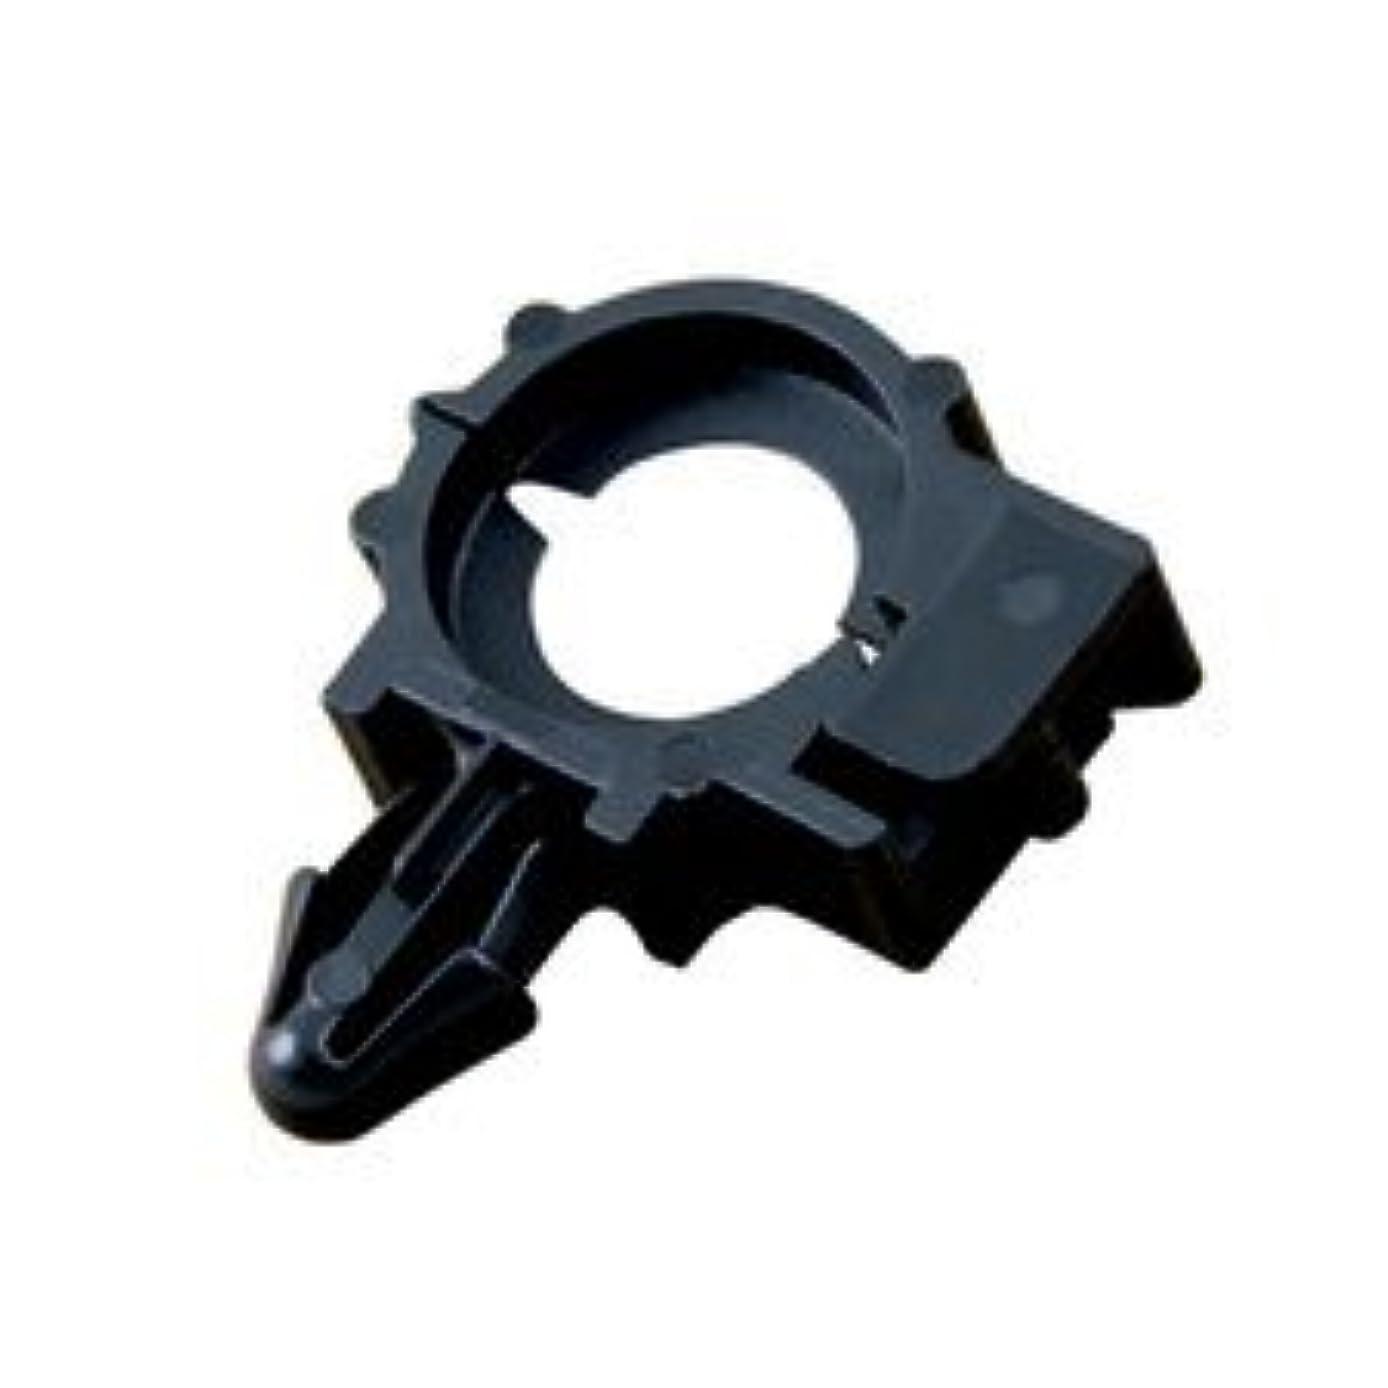 Wire Loom Accessory Clip 0.35 25 Min -Set Of 25